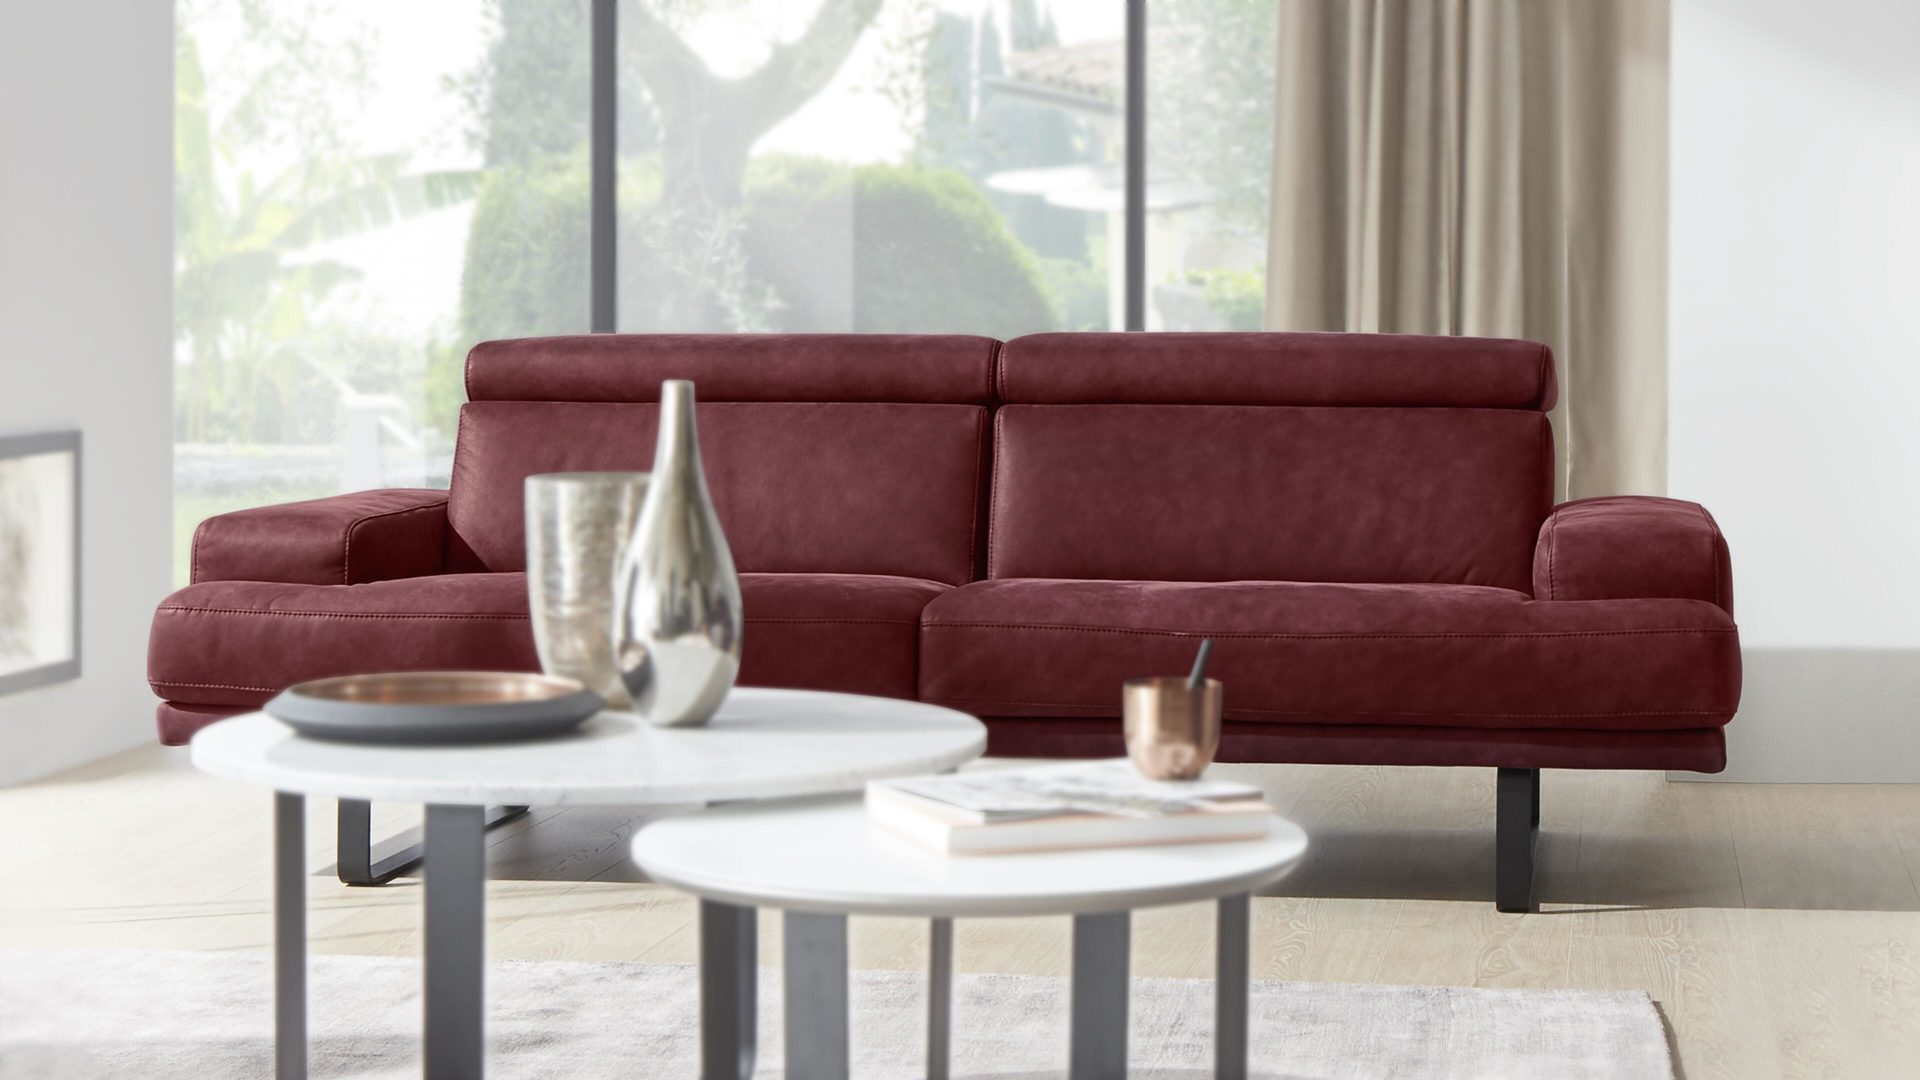 Interliving Sofa Serie 4152 Dreisitzer Ledercouch Dunkelrotes